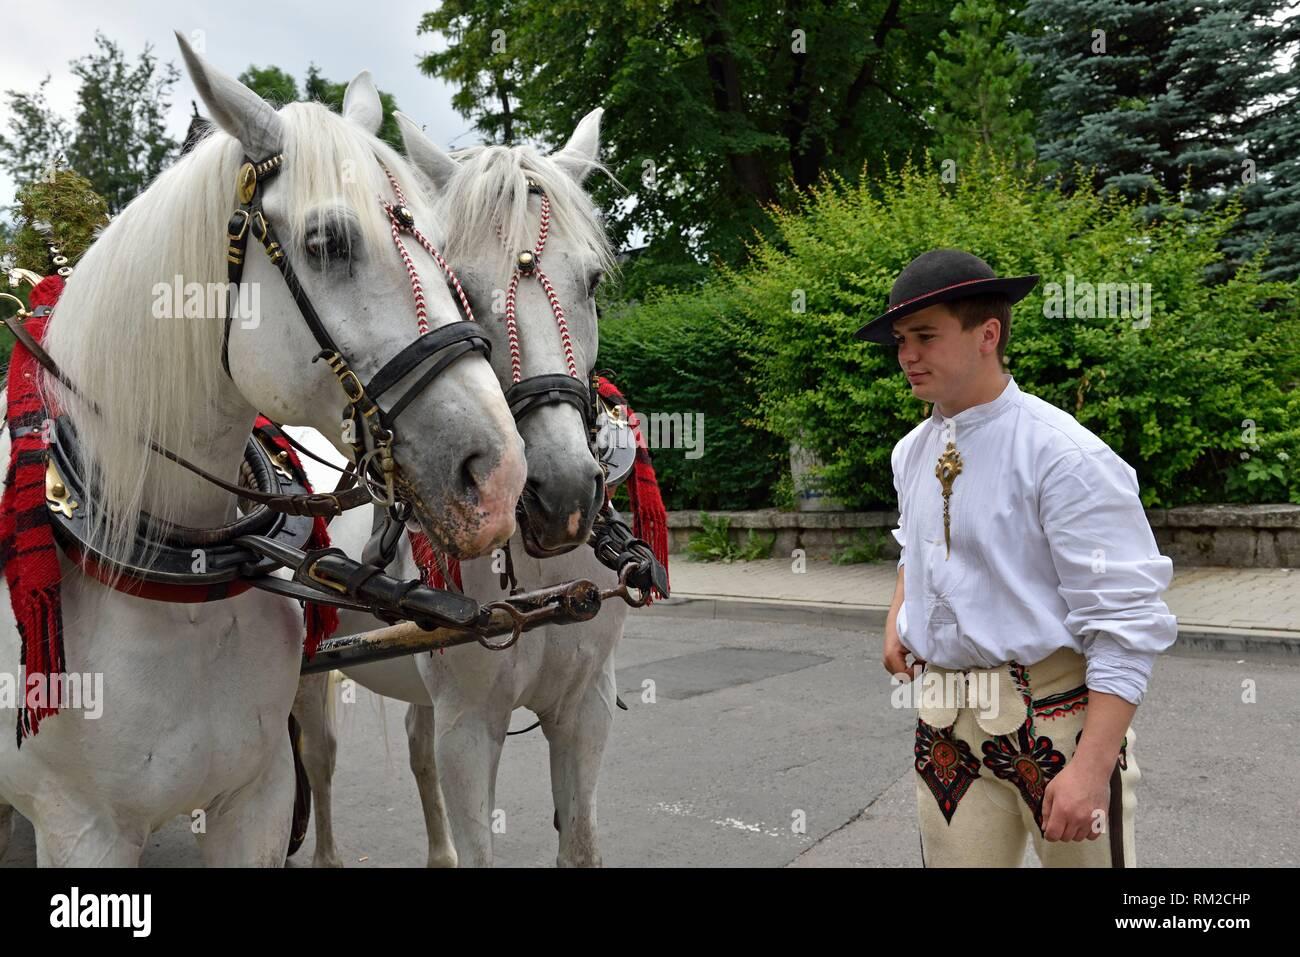 young coachman of carriage with his horses, Zakopane, Podhale region, Tatra Mountains, Malopolska Province (Lesser Poland), Poland, Central Europe. - Stock Image